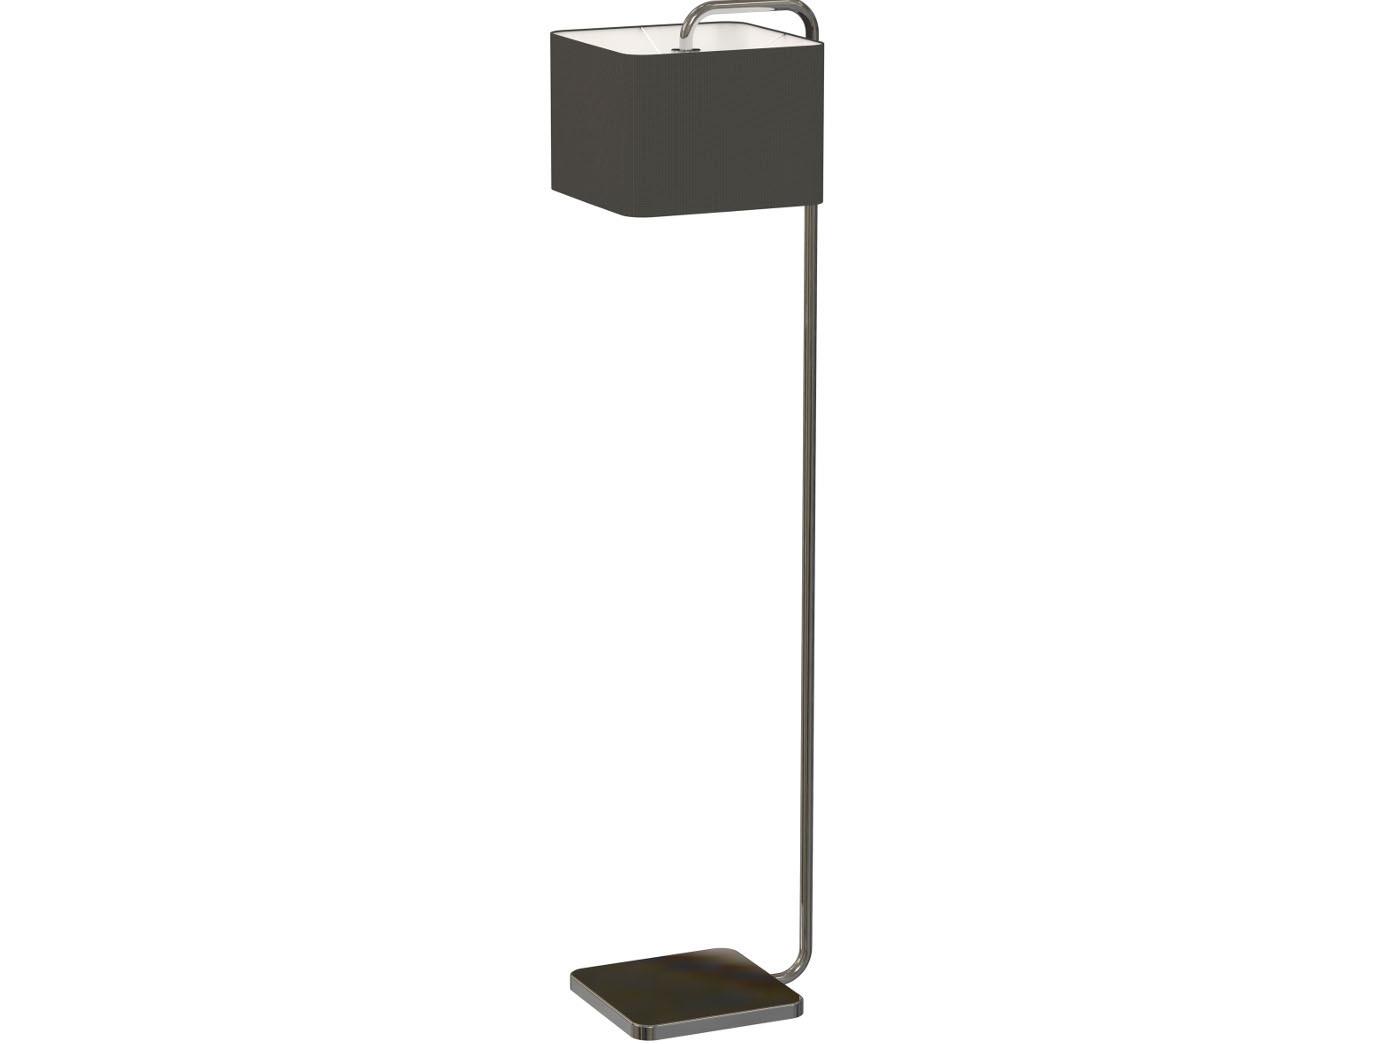 Moderne Stehlampe Cube Mit Dimmbare Led Eckiger Stoffschirm